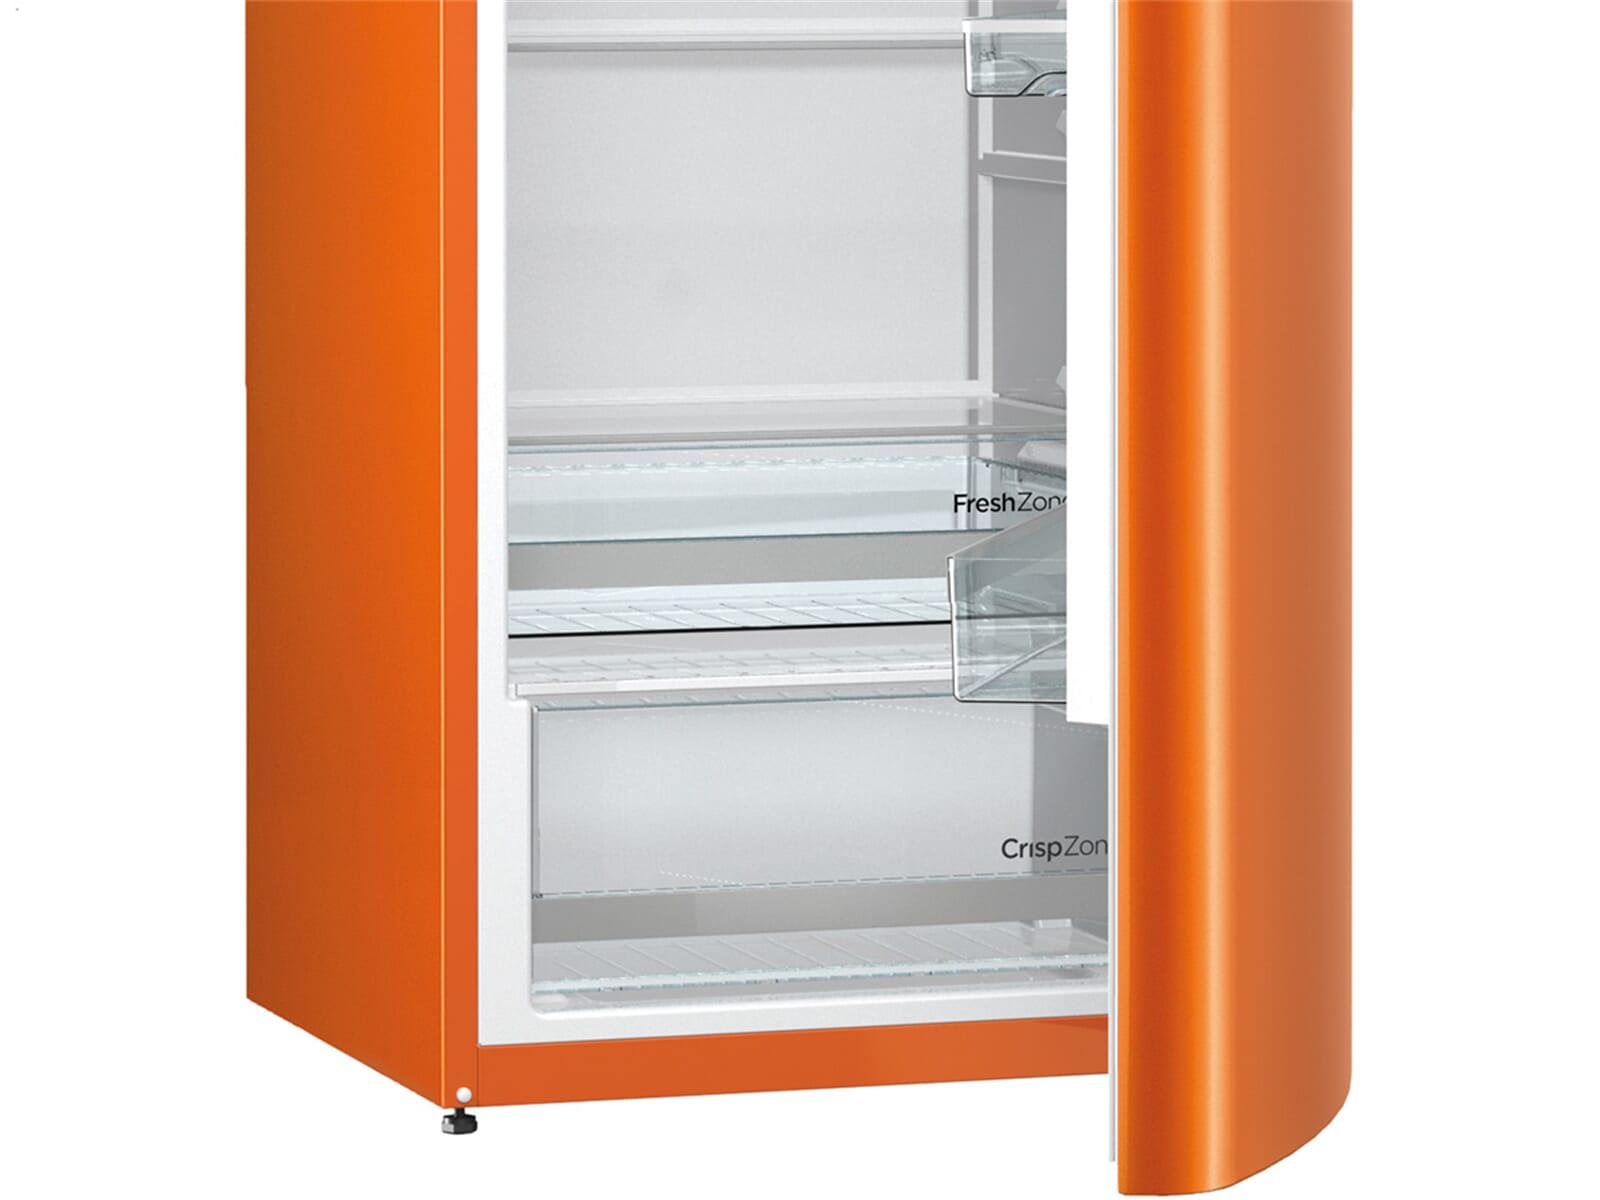 Gorenje Kühlschrank Orange : Gorenje orb o standkühlschrank juicy orange ebay